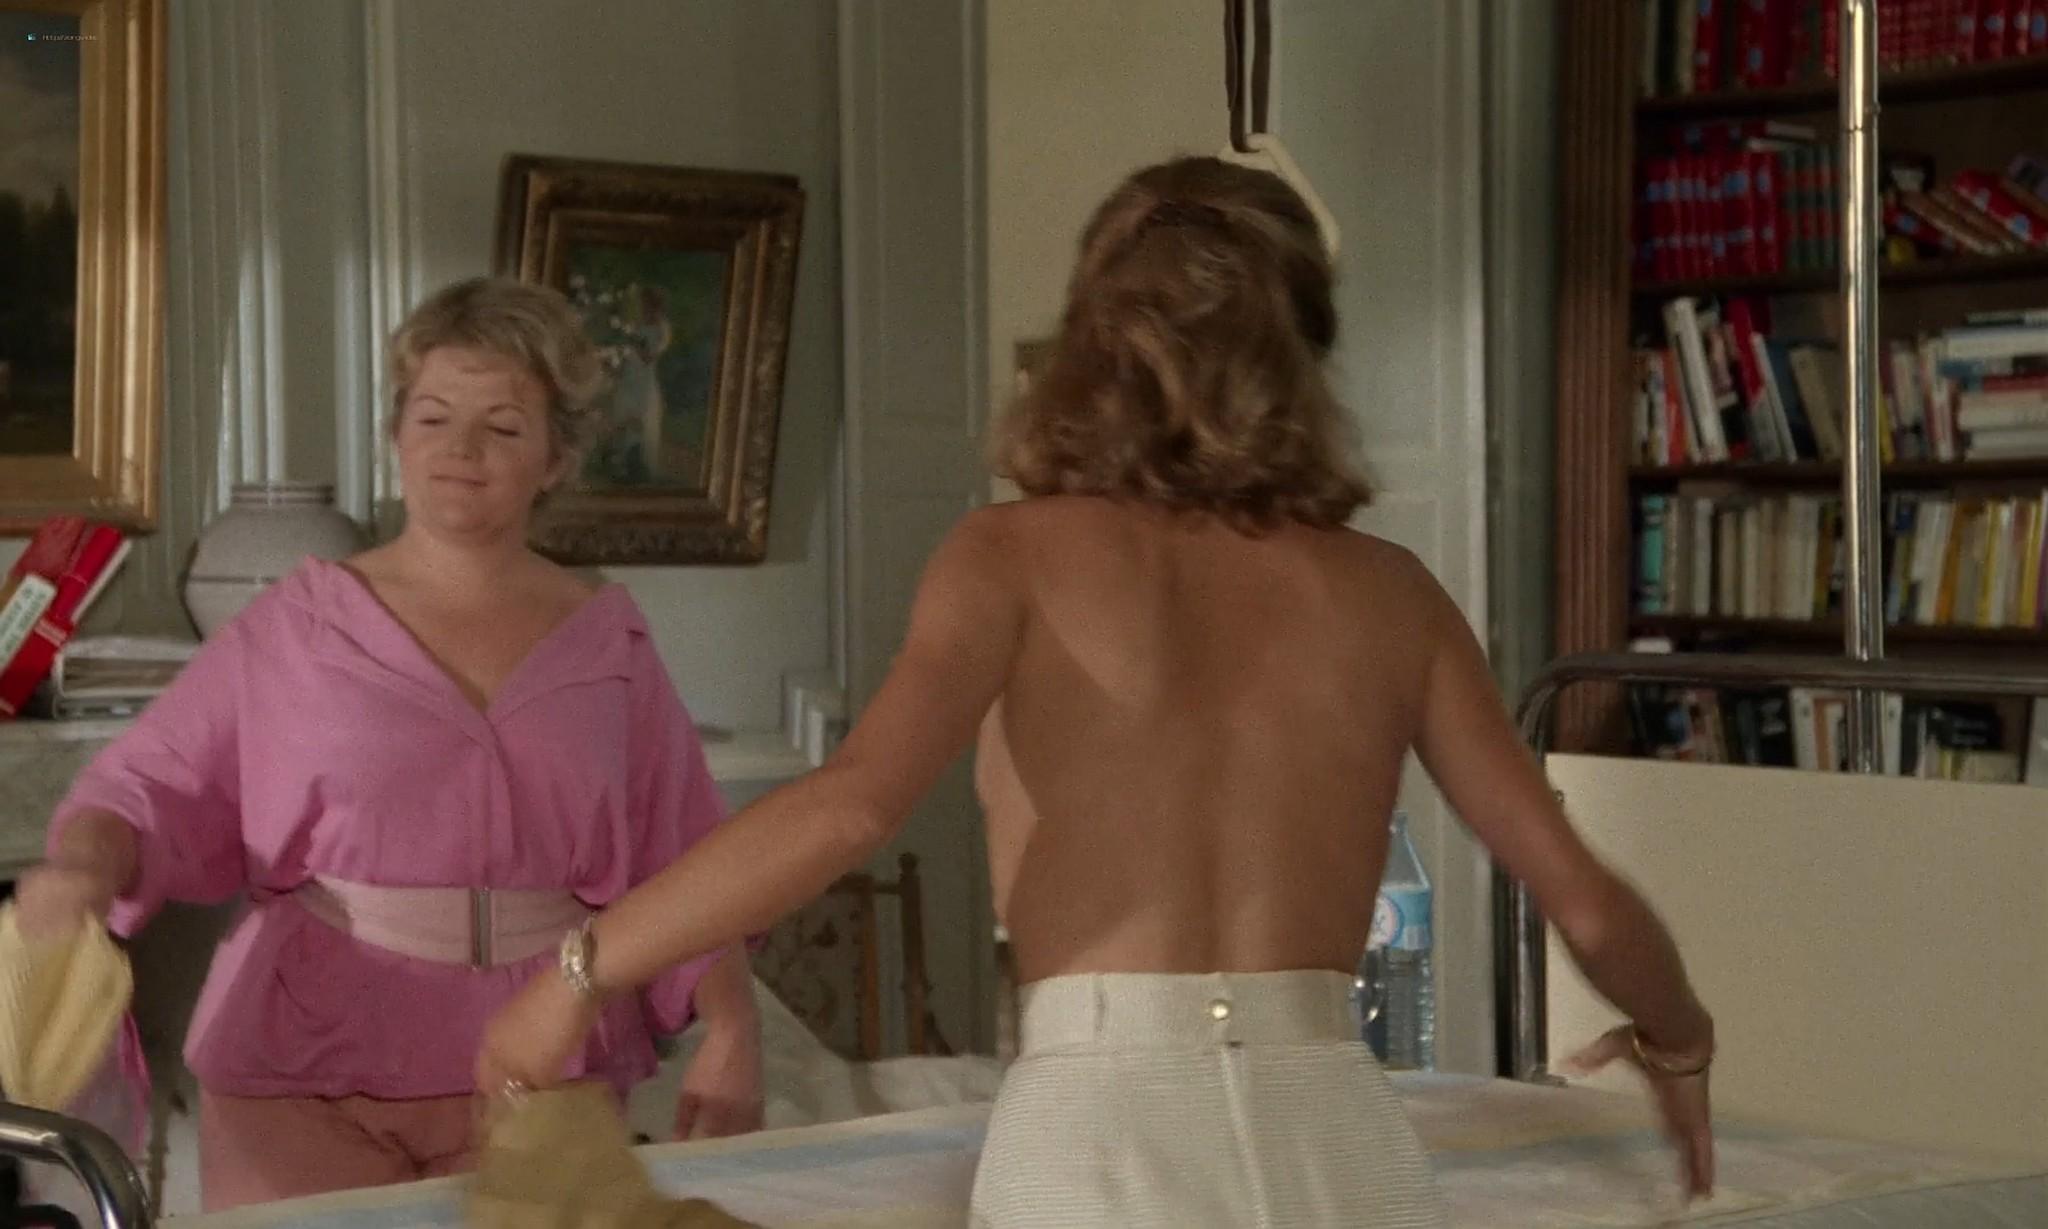 Nathalie Baye nude in the shower En toute innocence FR 1988 1080p BluRay 5